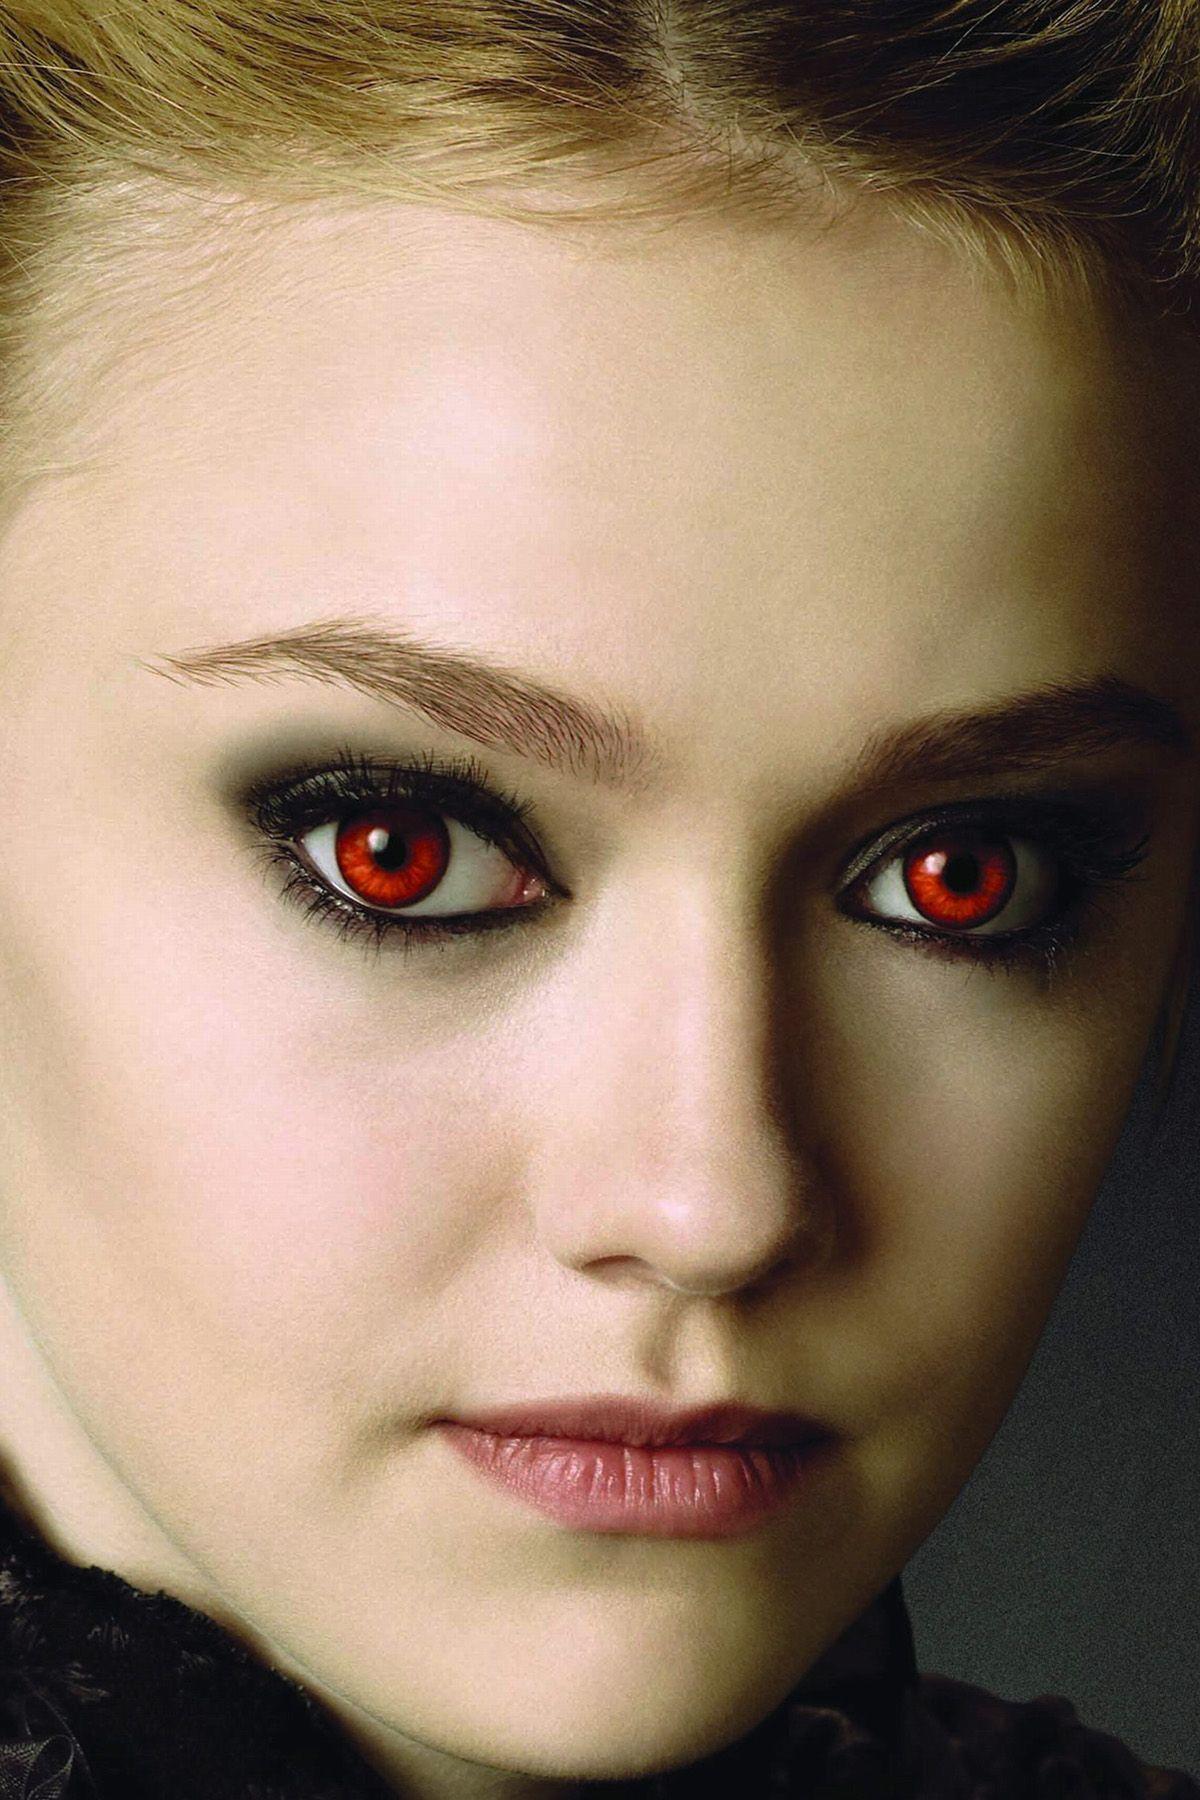 Dakota Fanning Twilight eyes | Wild eyes | Pinterest ...